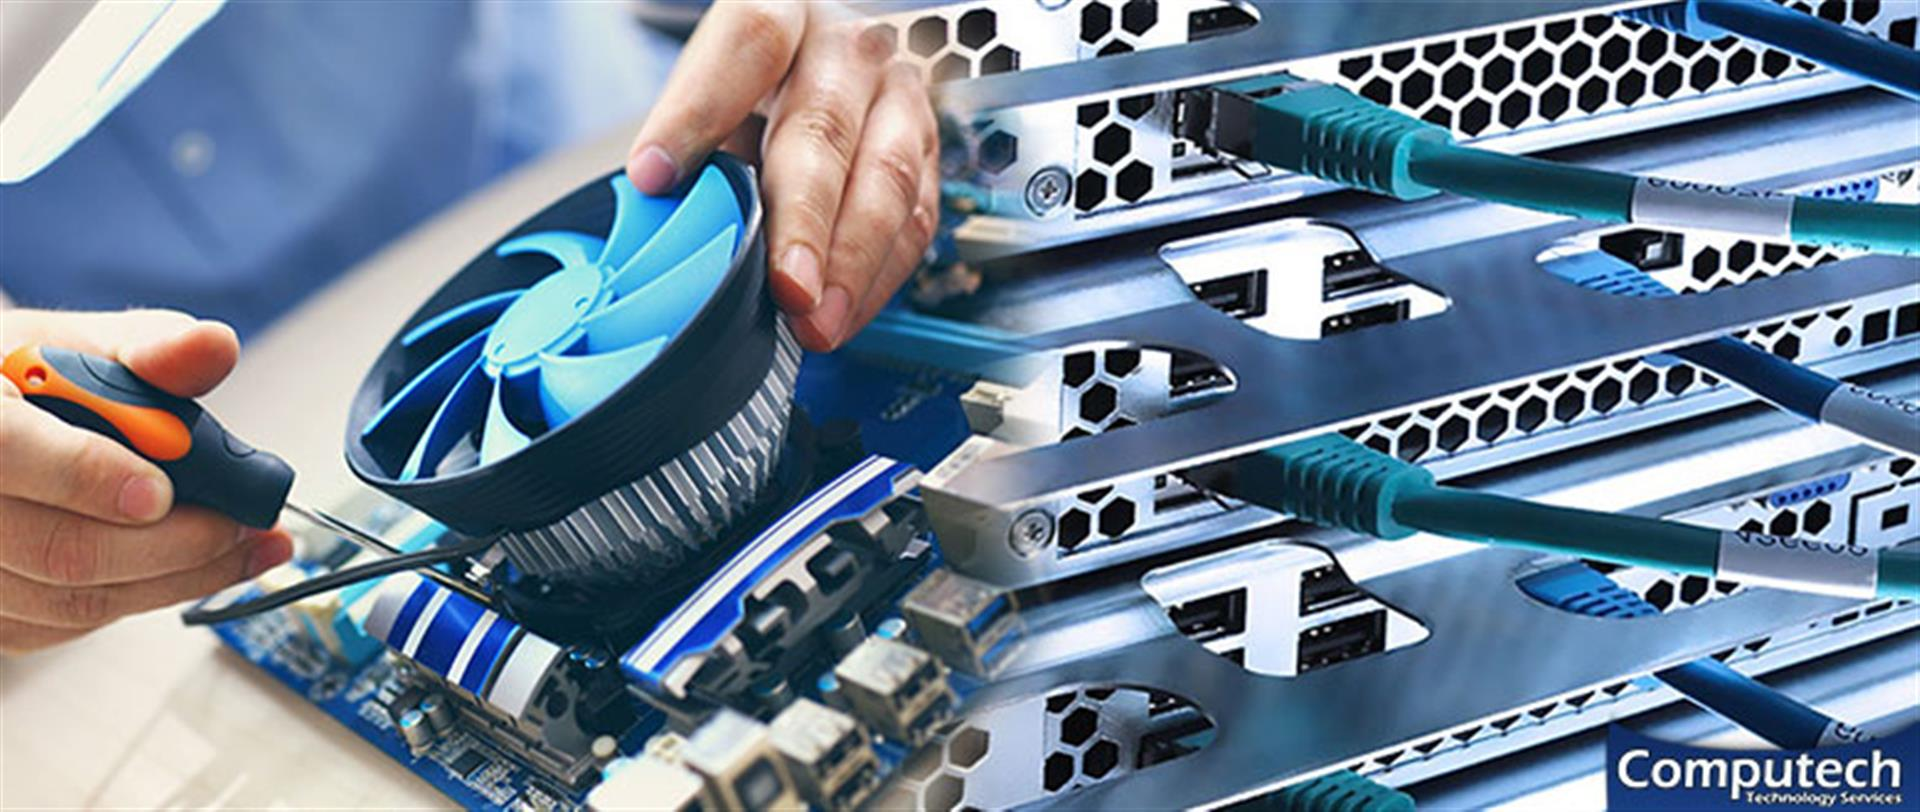 Camilla Georgia On Site Computer PC & Printer Repairs, Network, Voice & Data Cabling Services